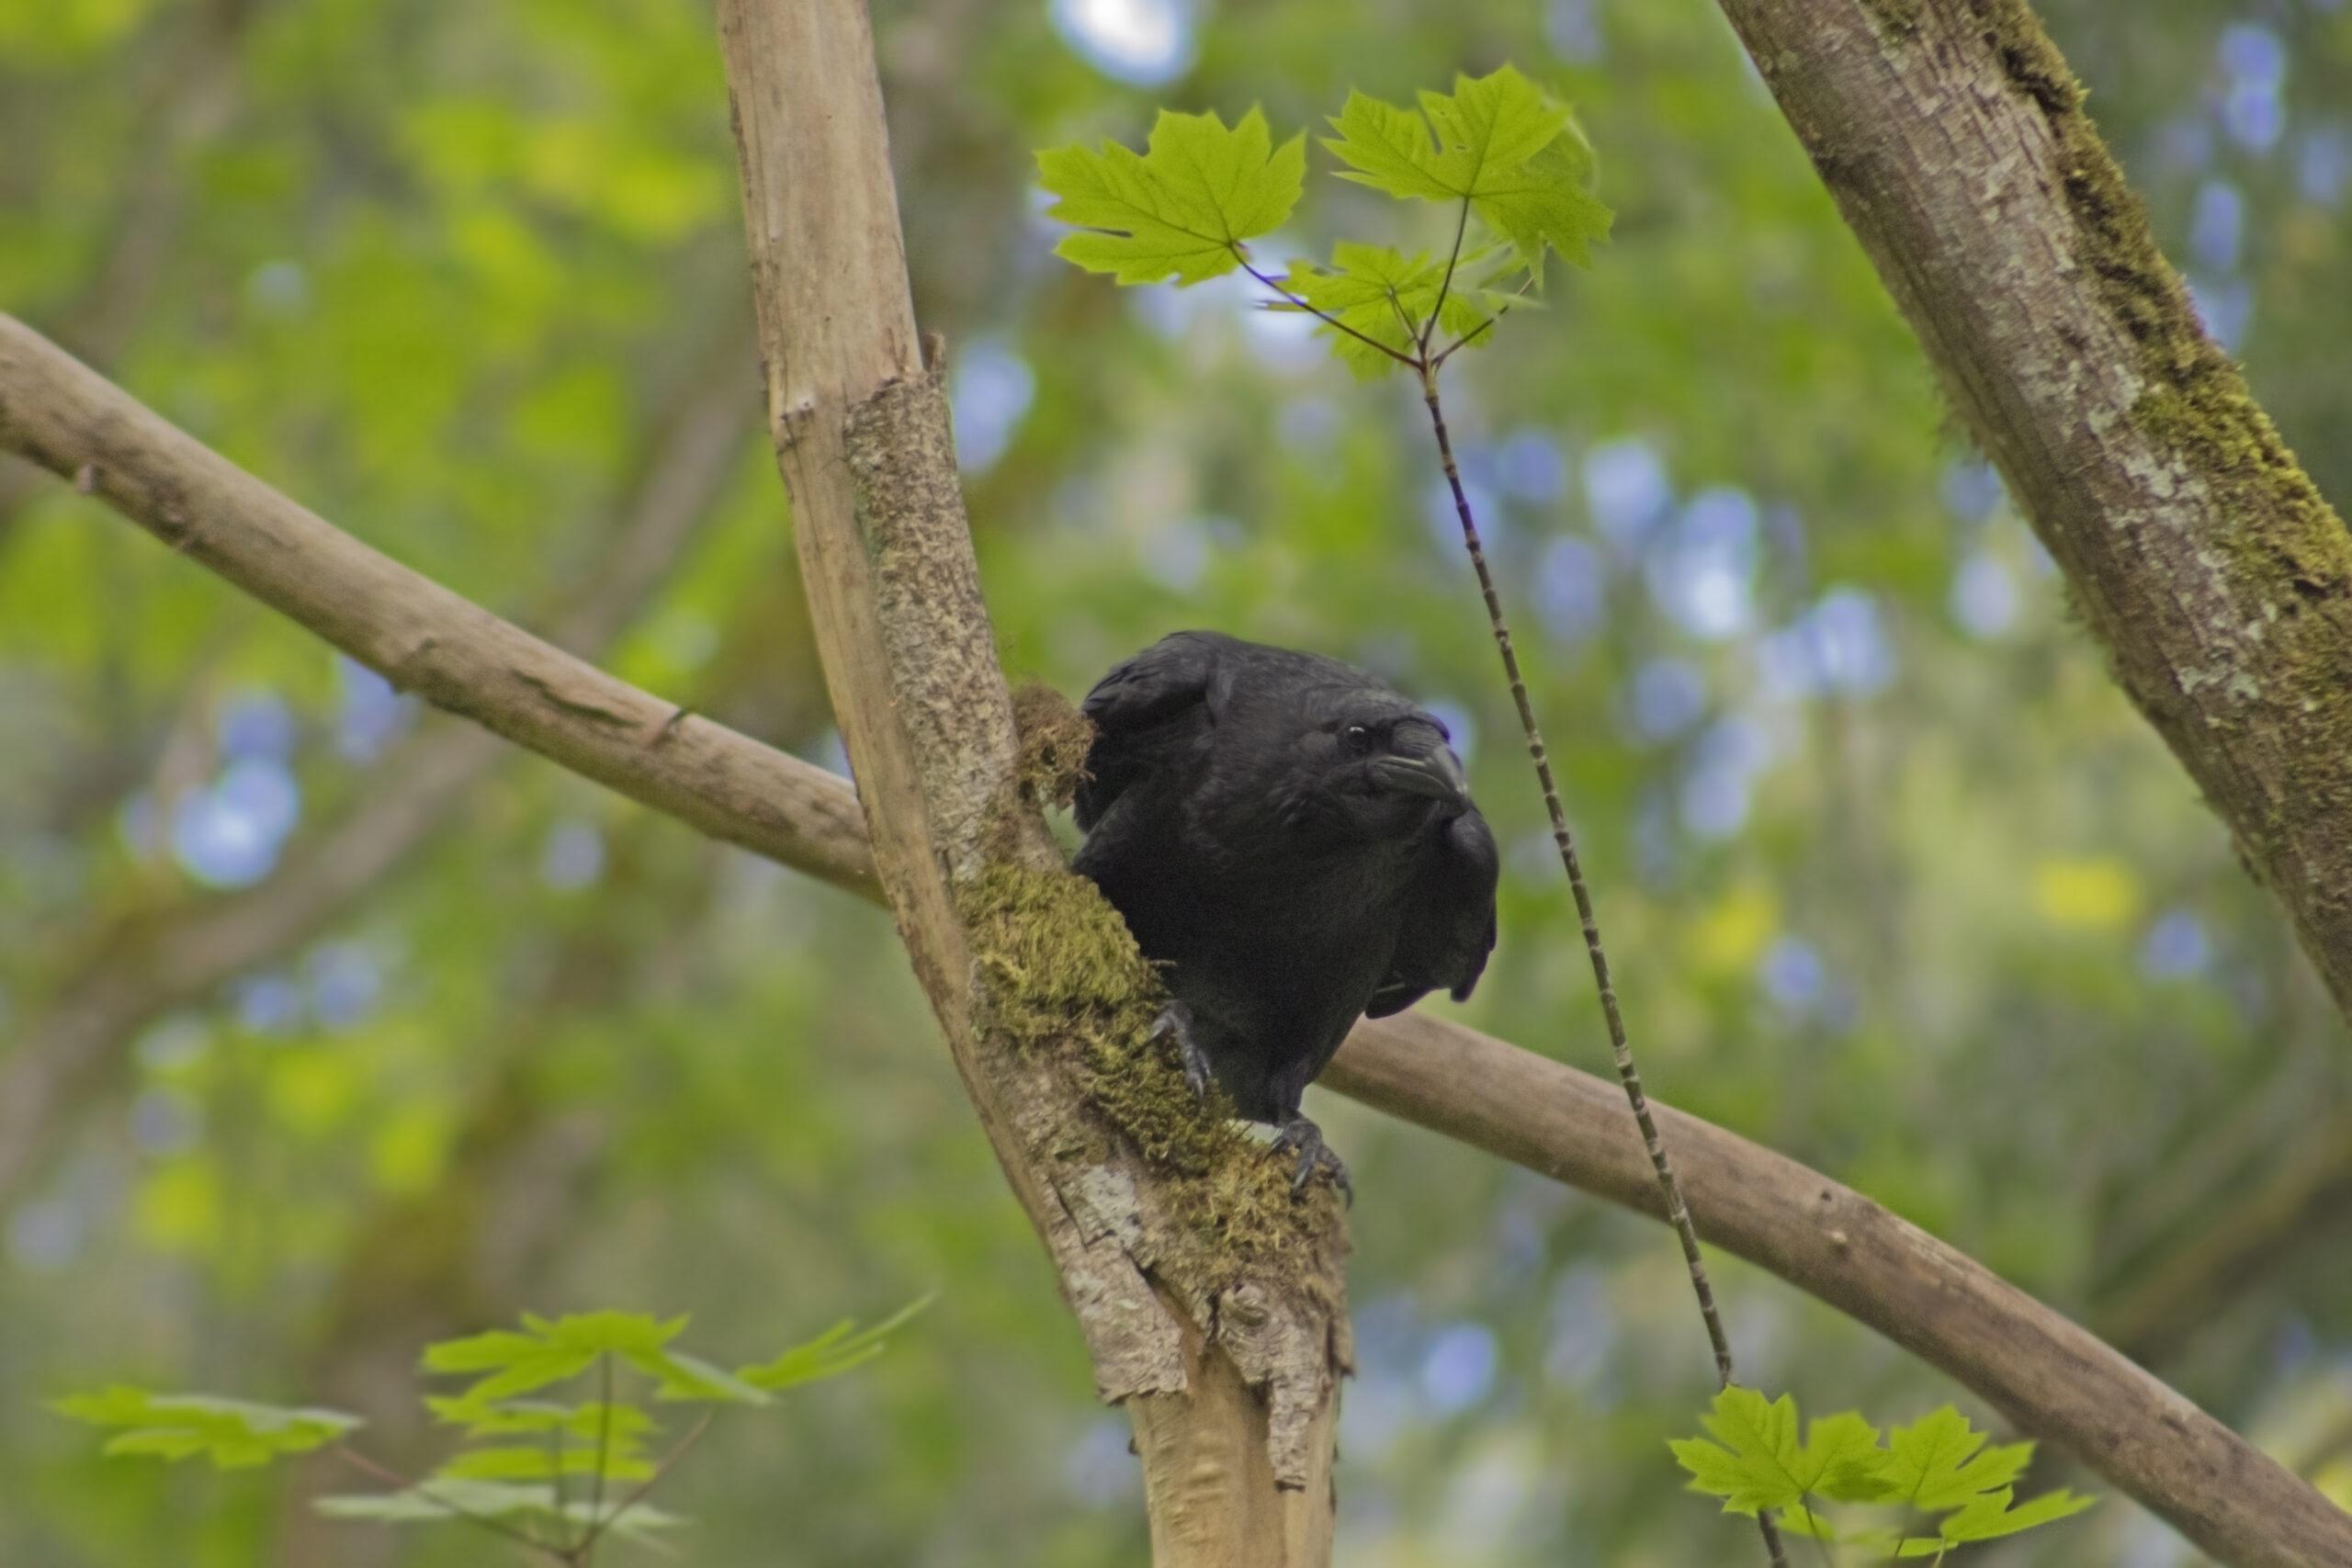 Raven, May 1, 2021